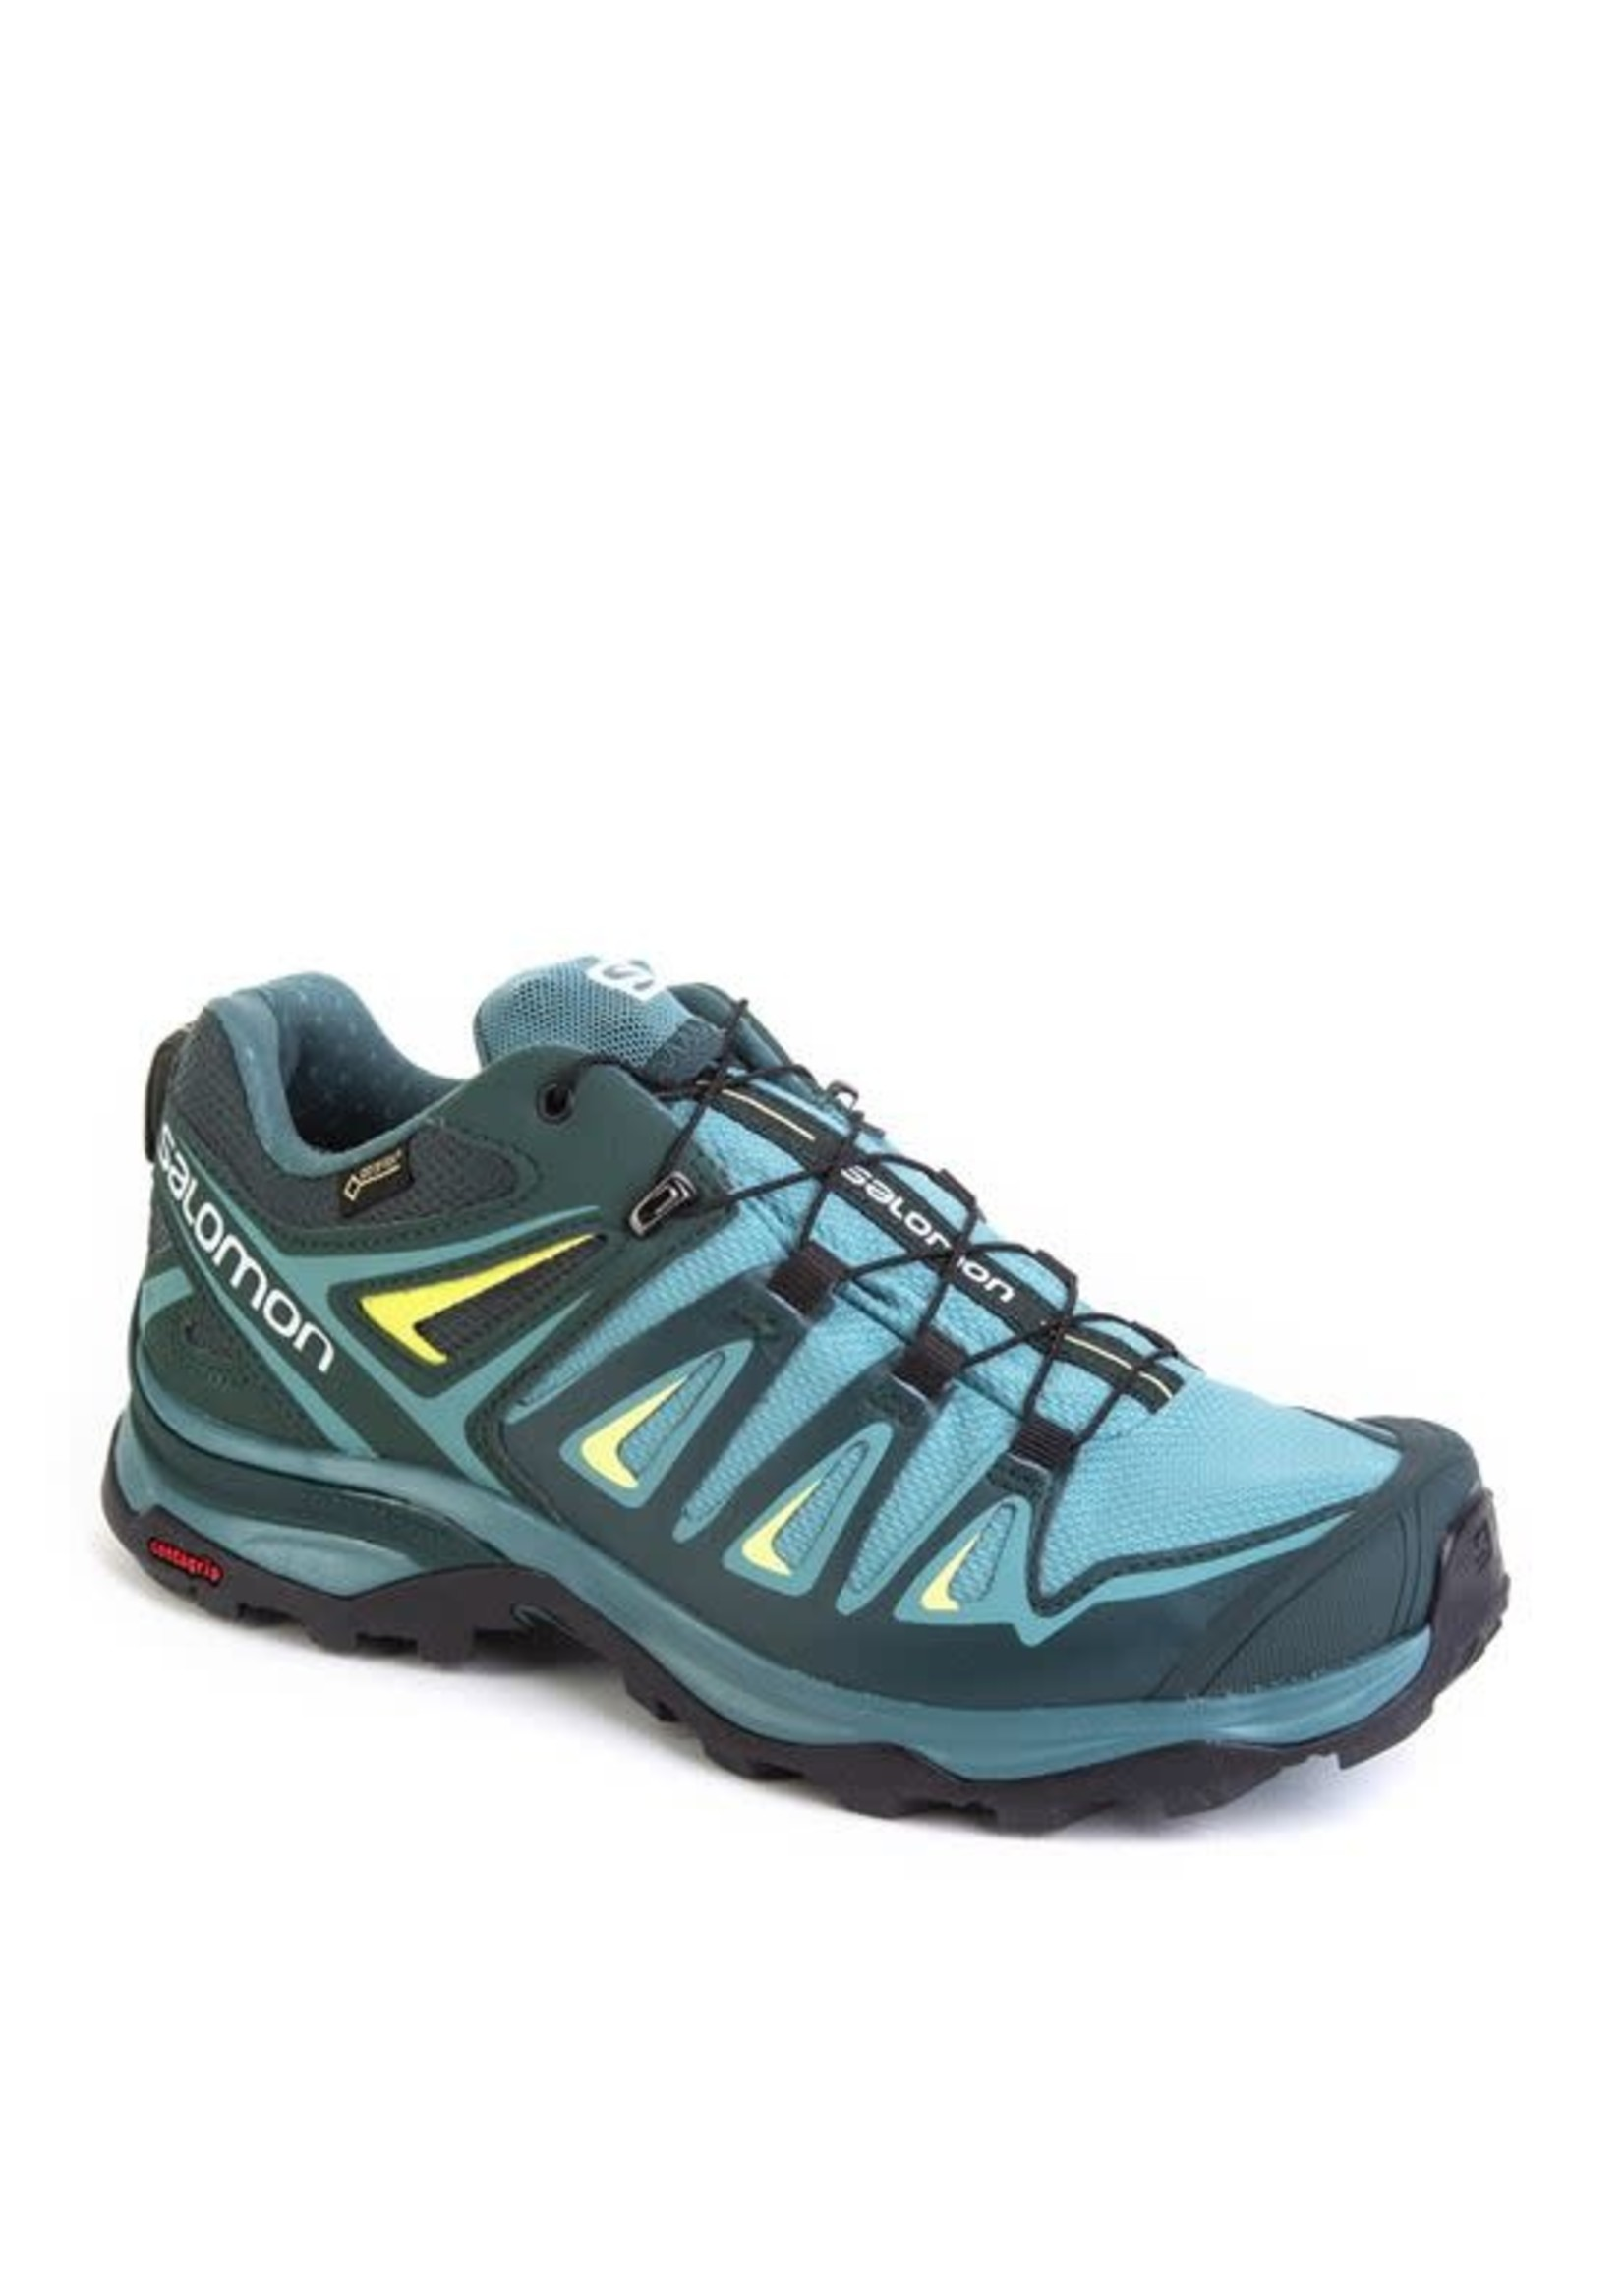 Salomon Salomon X Ultra 3 GTX Ladies Shoe (2020)